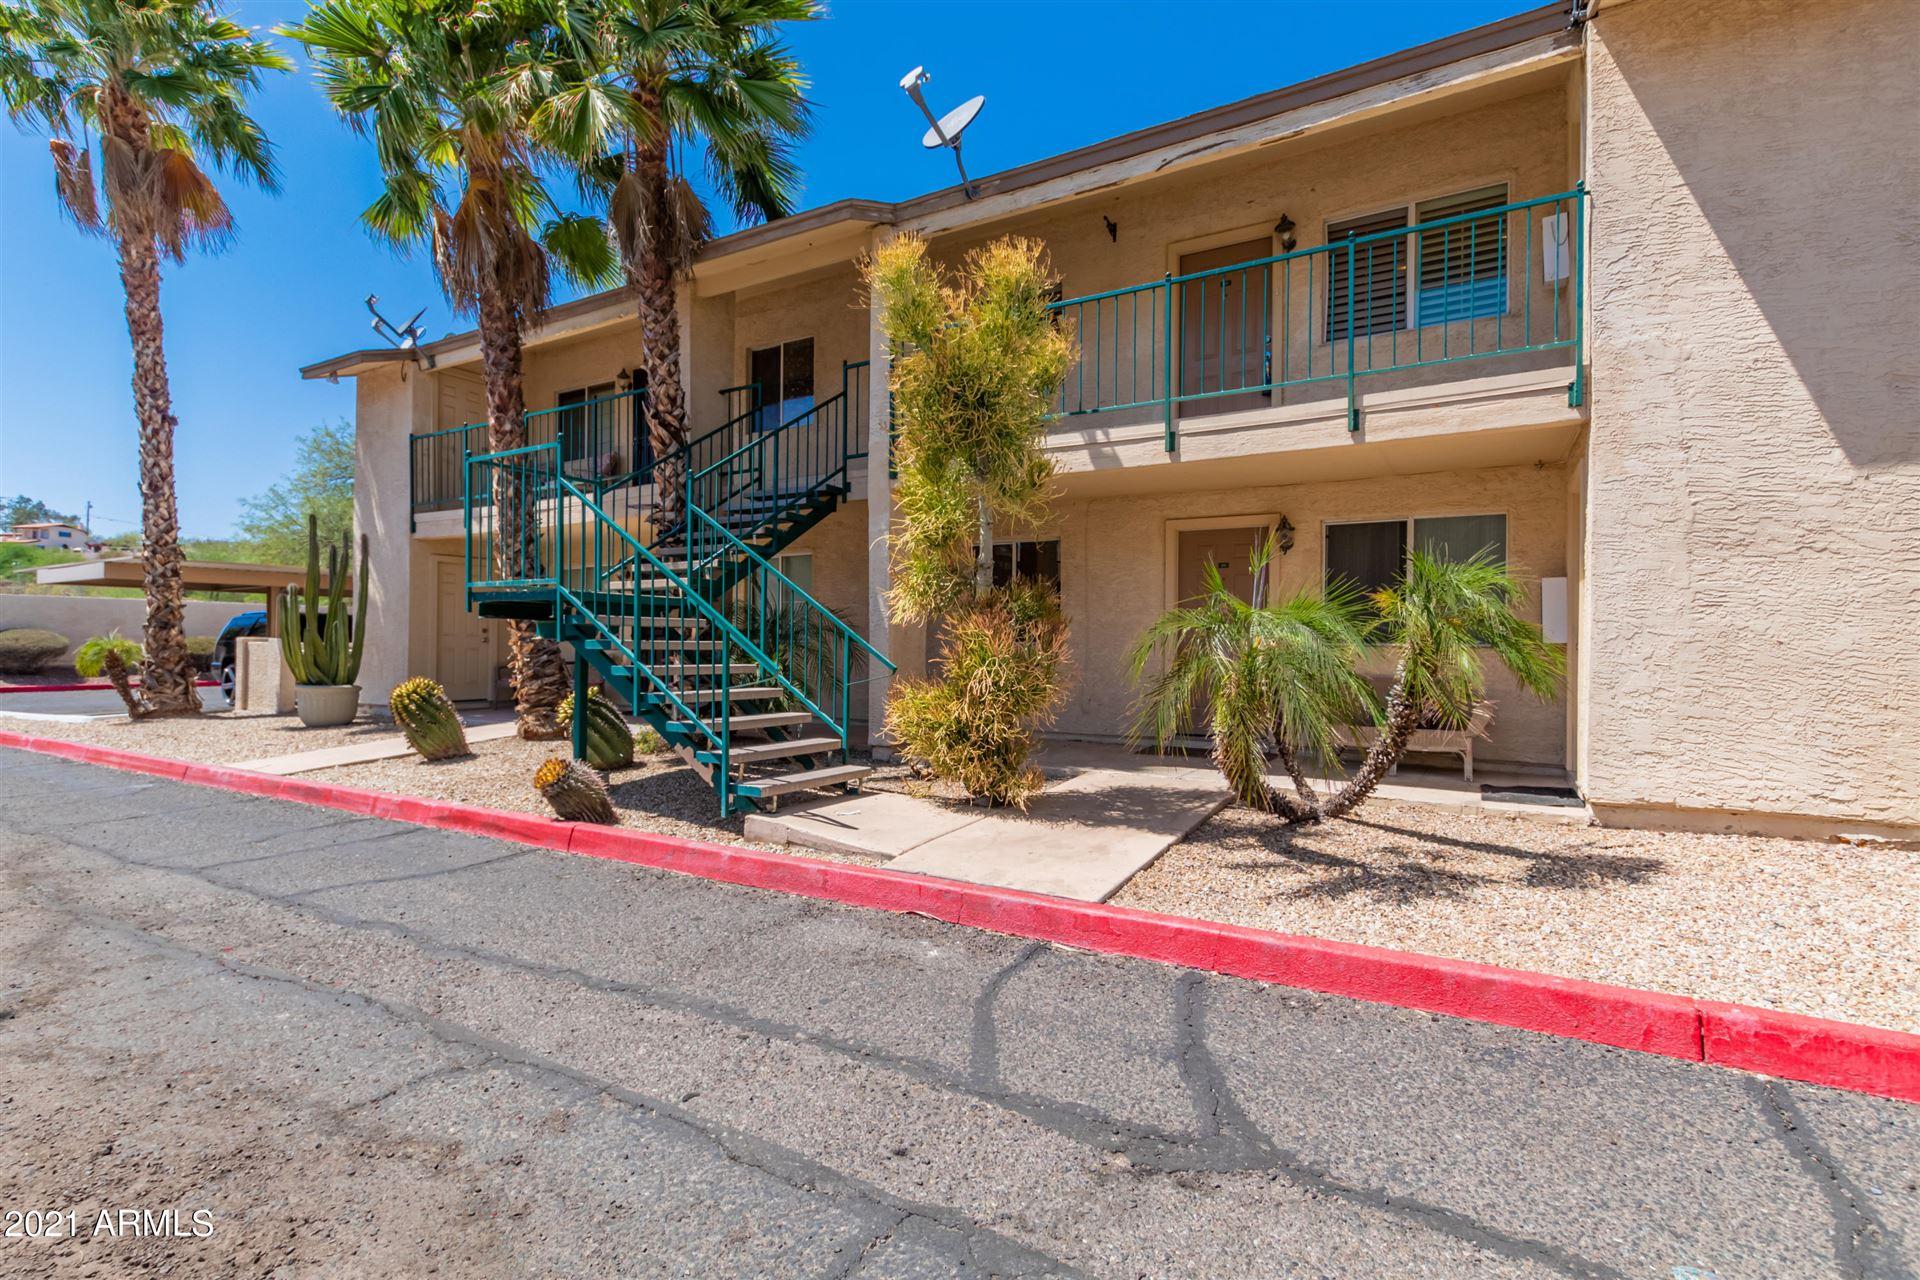 12440 N 20TH Street #209, Phoenix, AZ 85022 - MLS#: 6228874